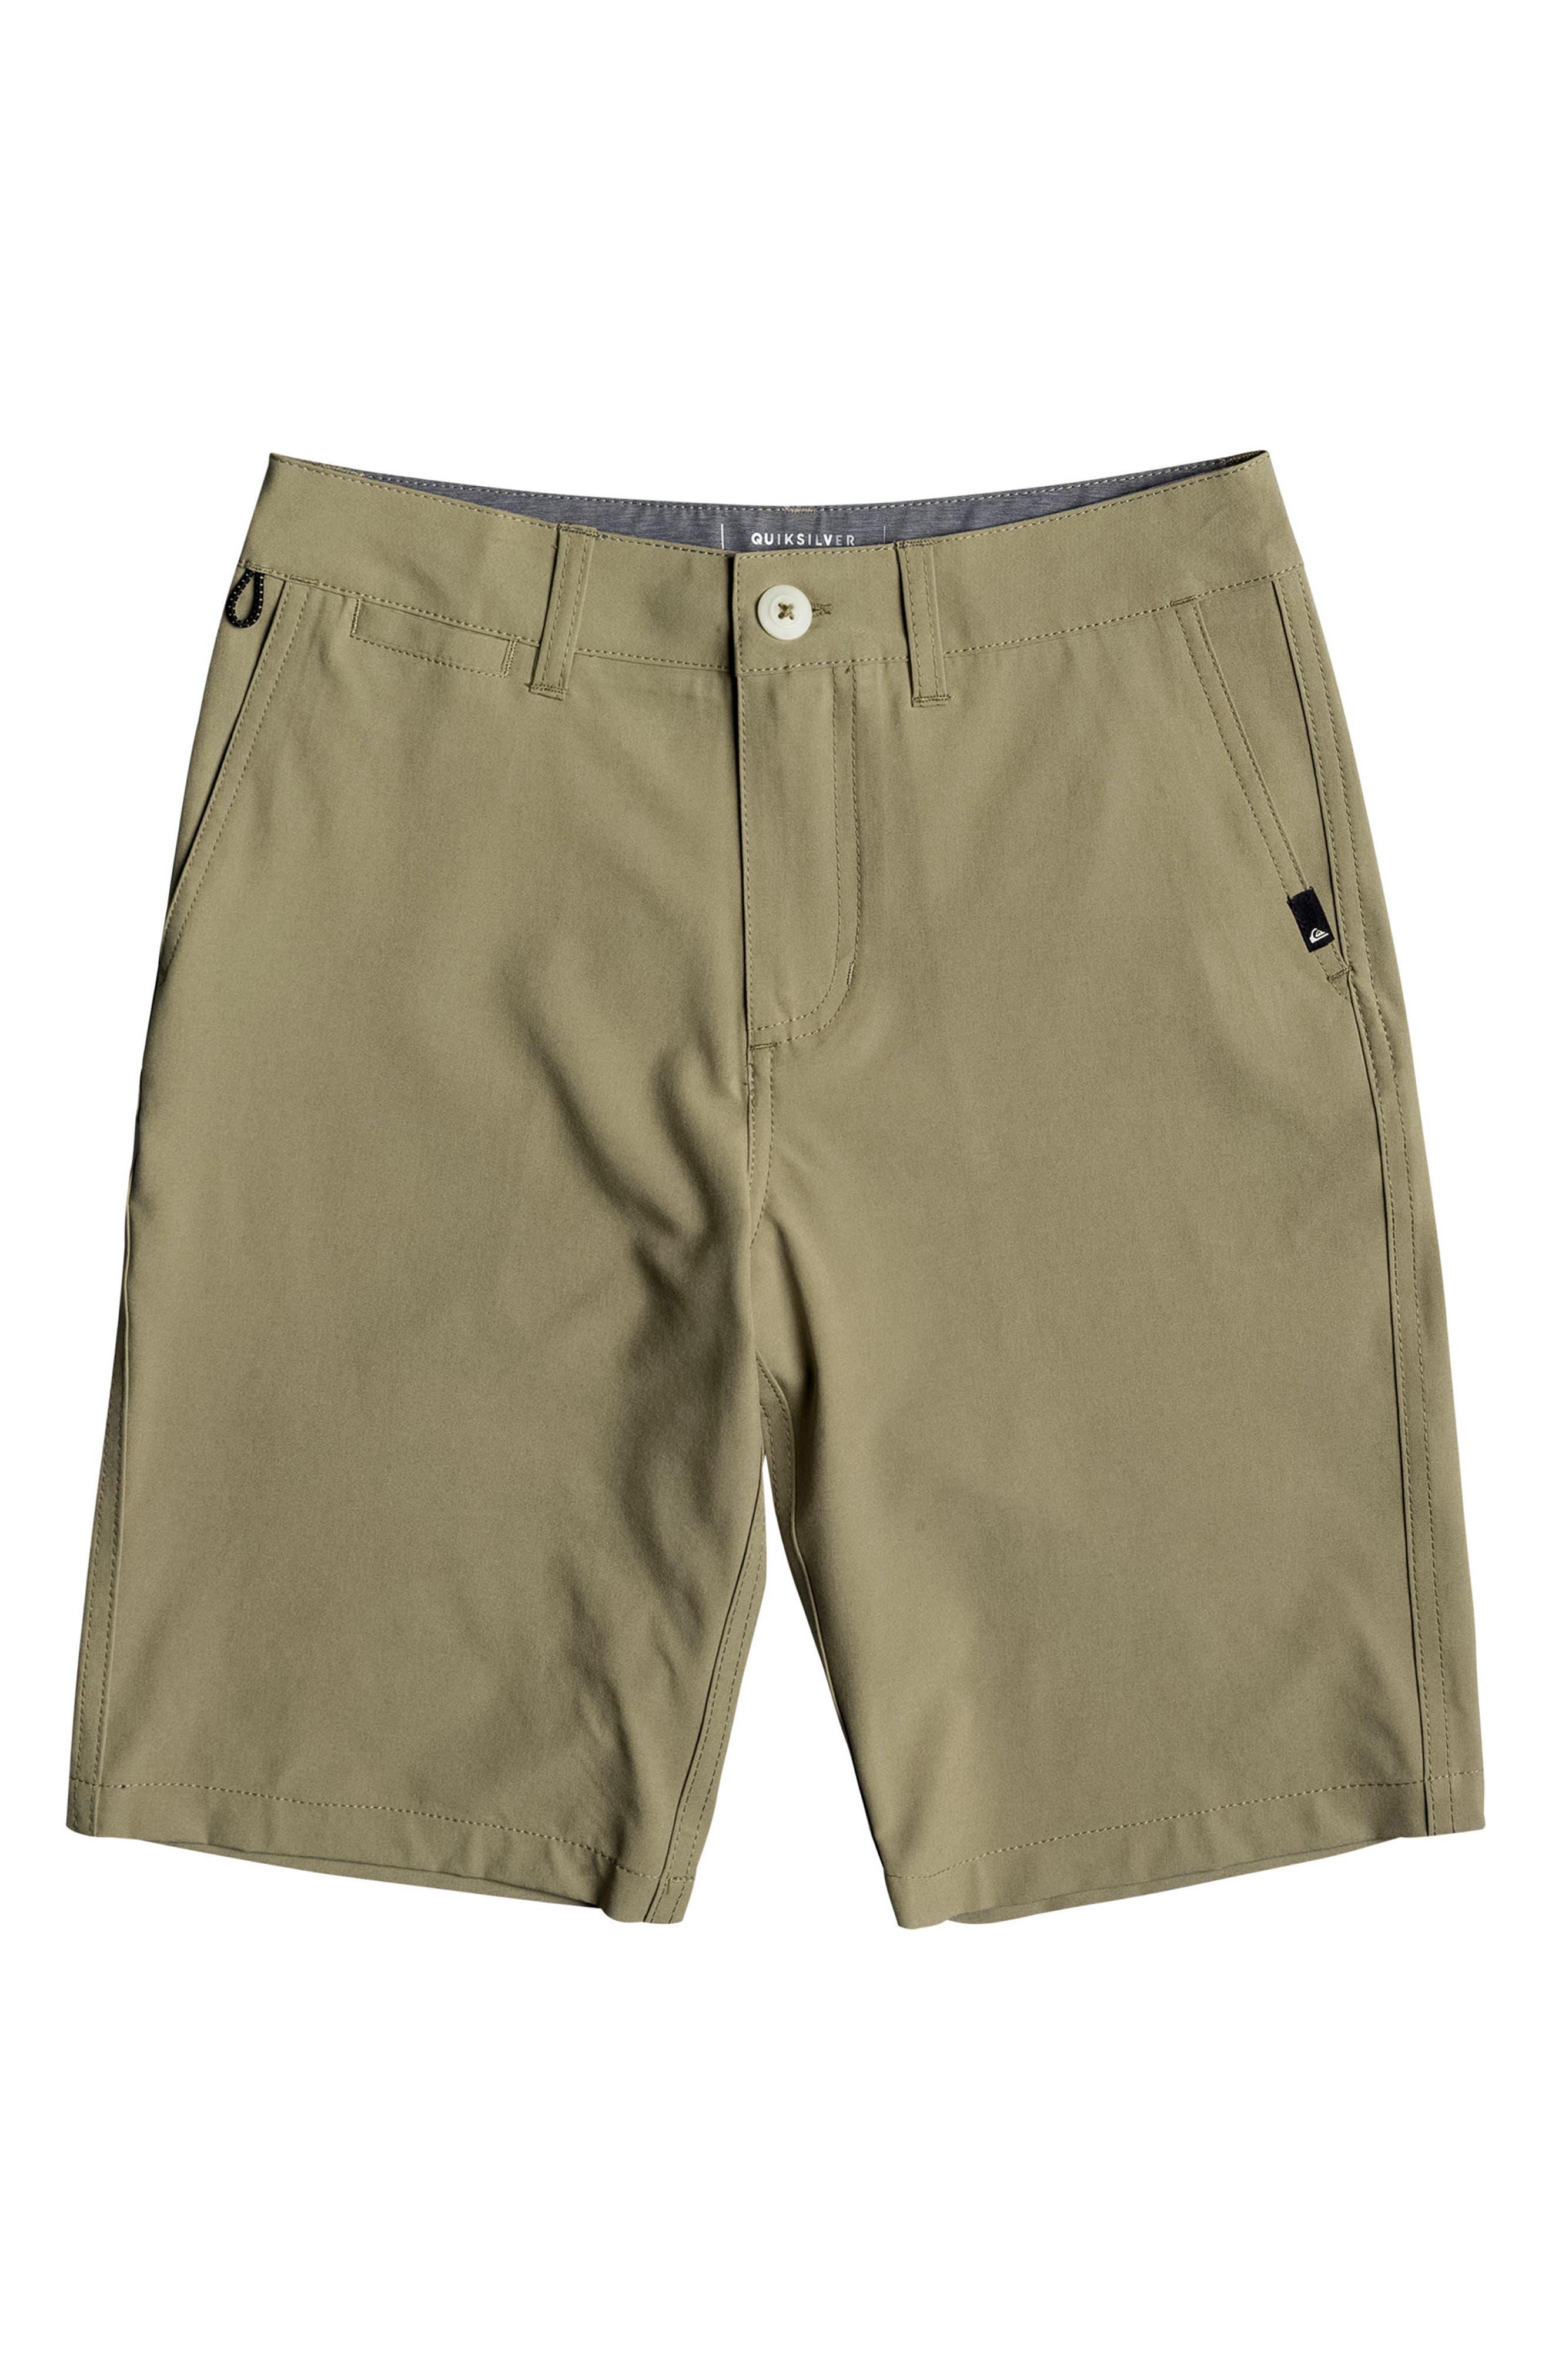 Union Amphibian Board Shorts,                             Main thumbnail 1, color,                             Elmwood